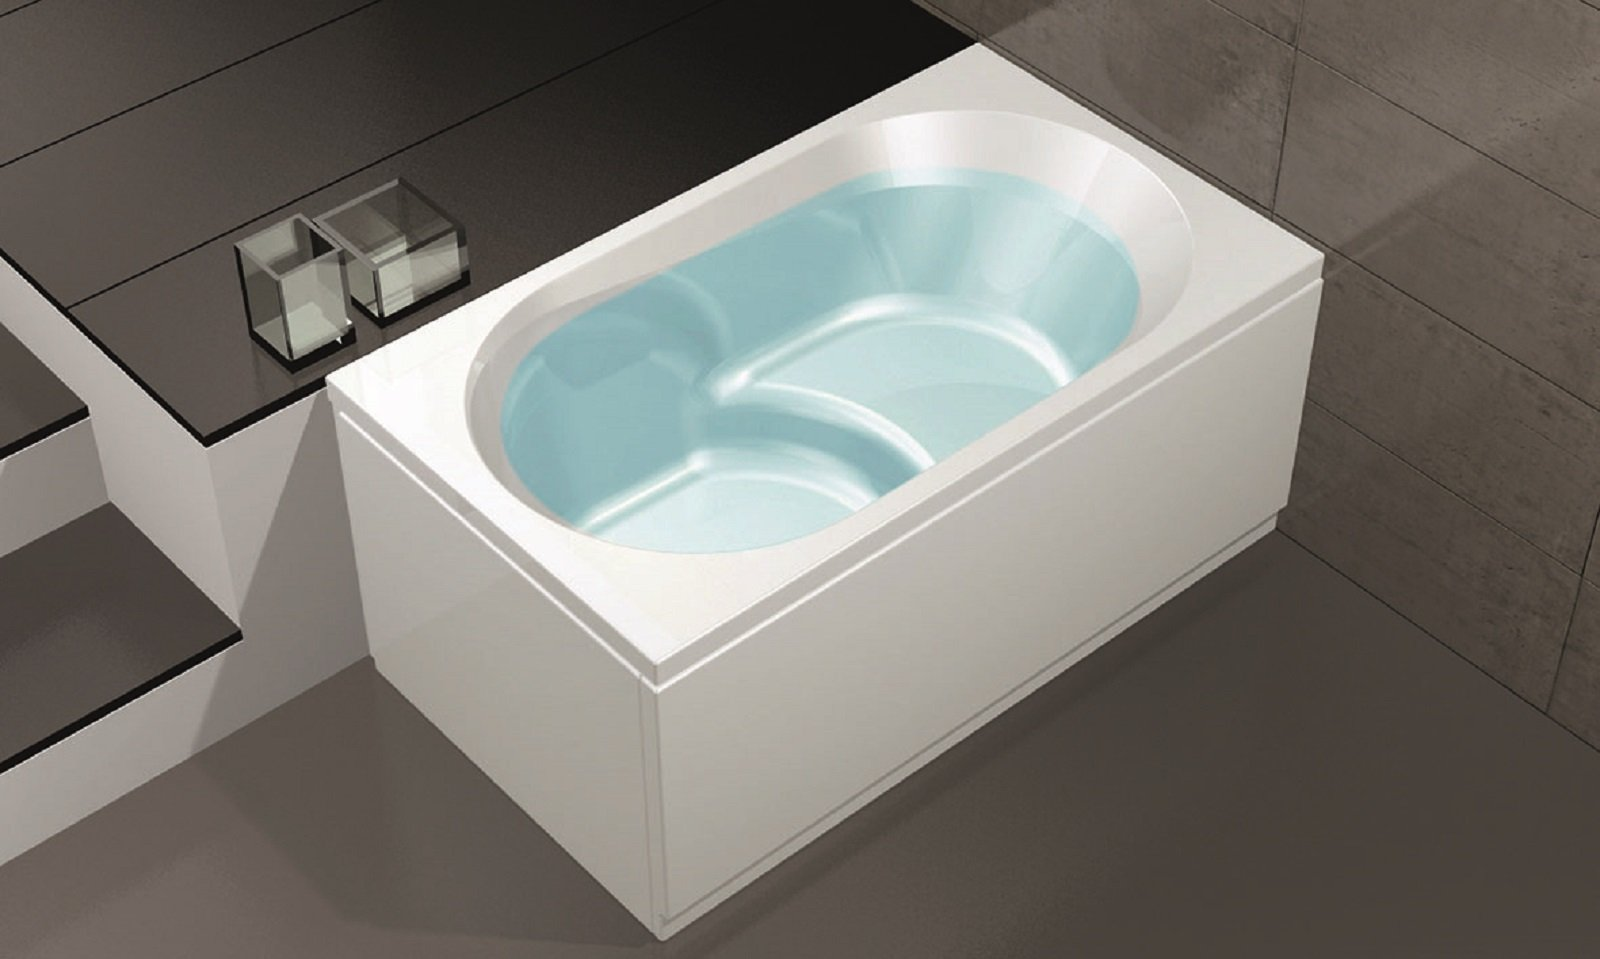 Vasche da bagno piccole ikea dh49 regardsdefemmes - Vasche da bagno rotonde ...